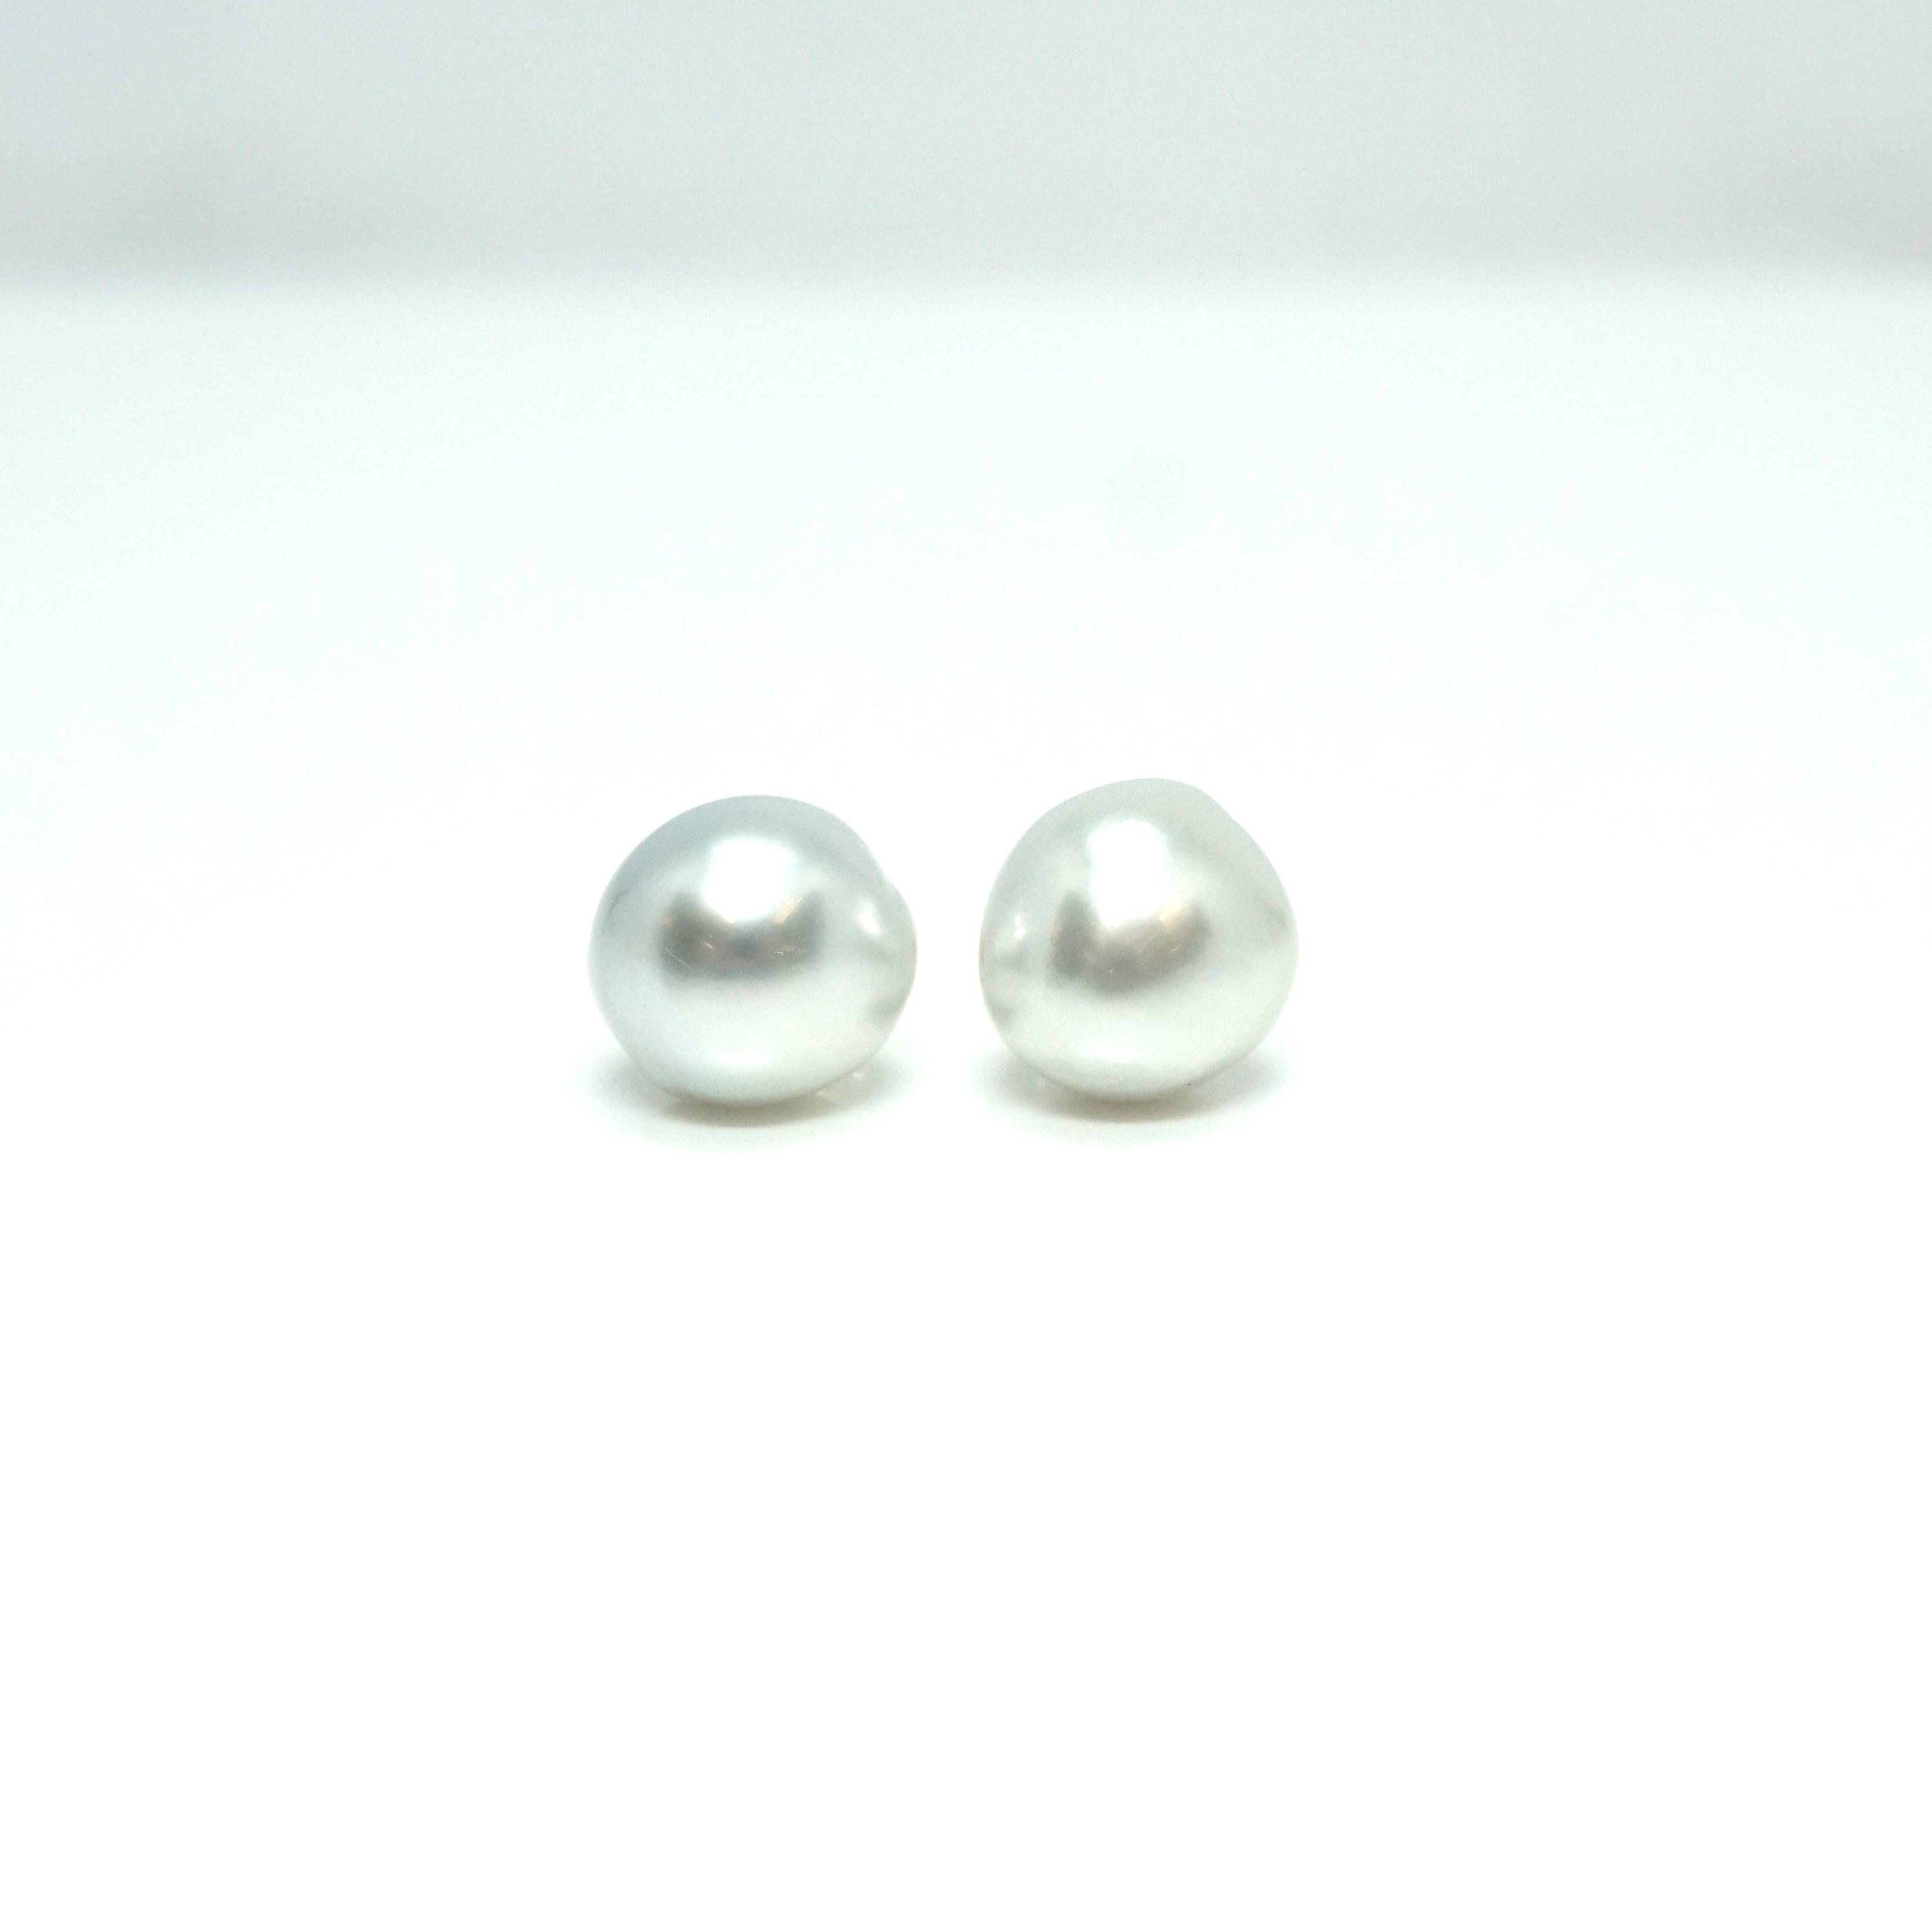 South pearl pierce - K18YG